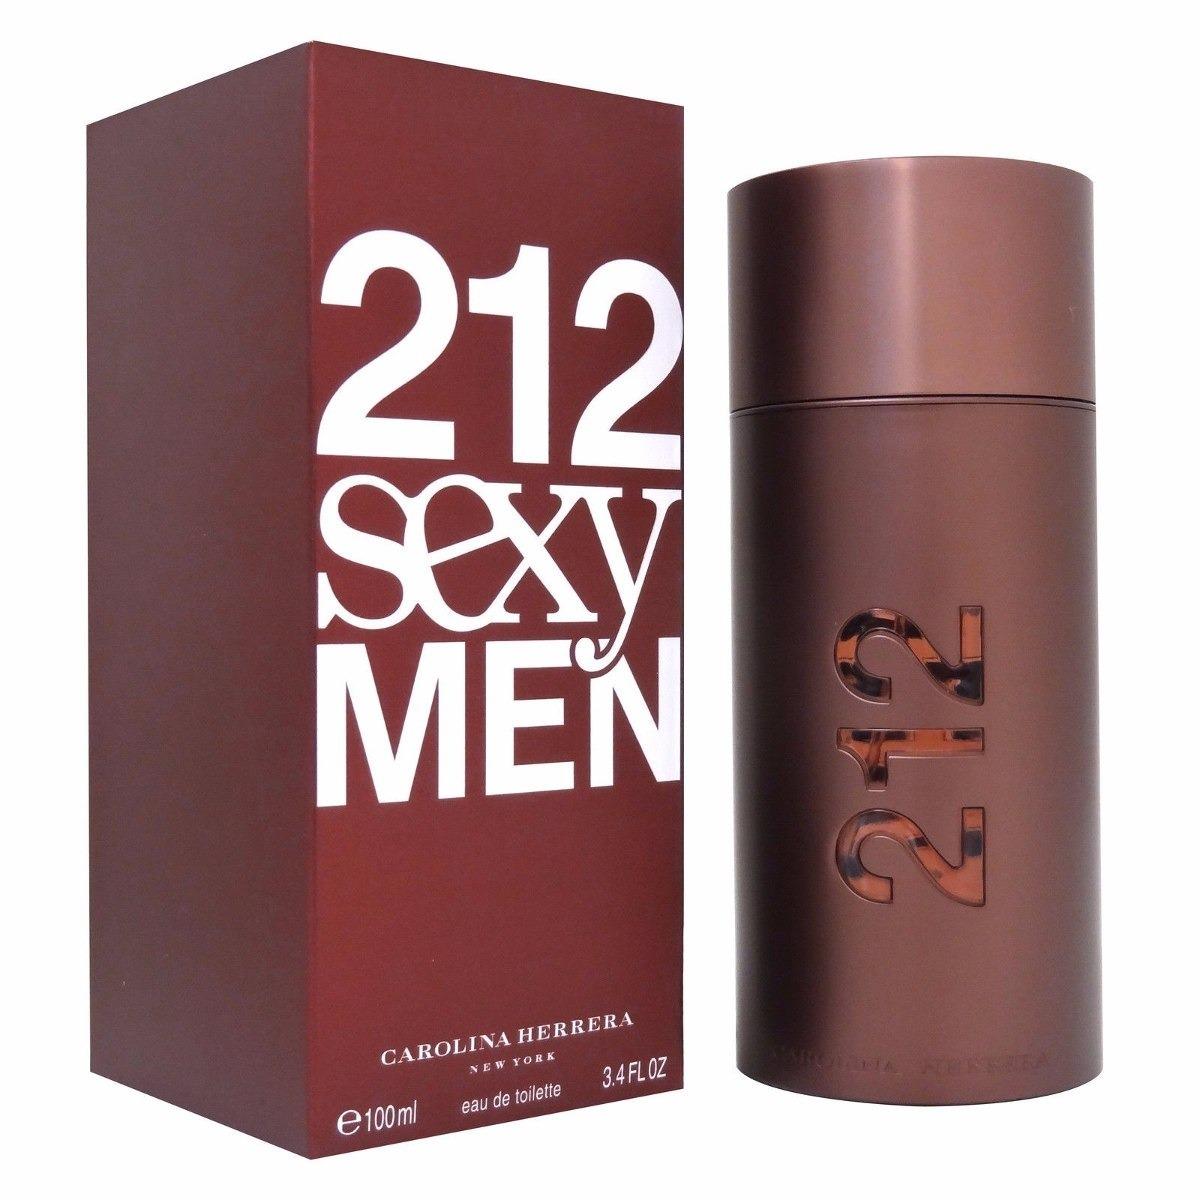 b01fb96a76 Perfume 212 Men Sexy Edt 100ml Carolina Herrera - $ 2.550,00 en ...